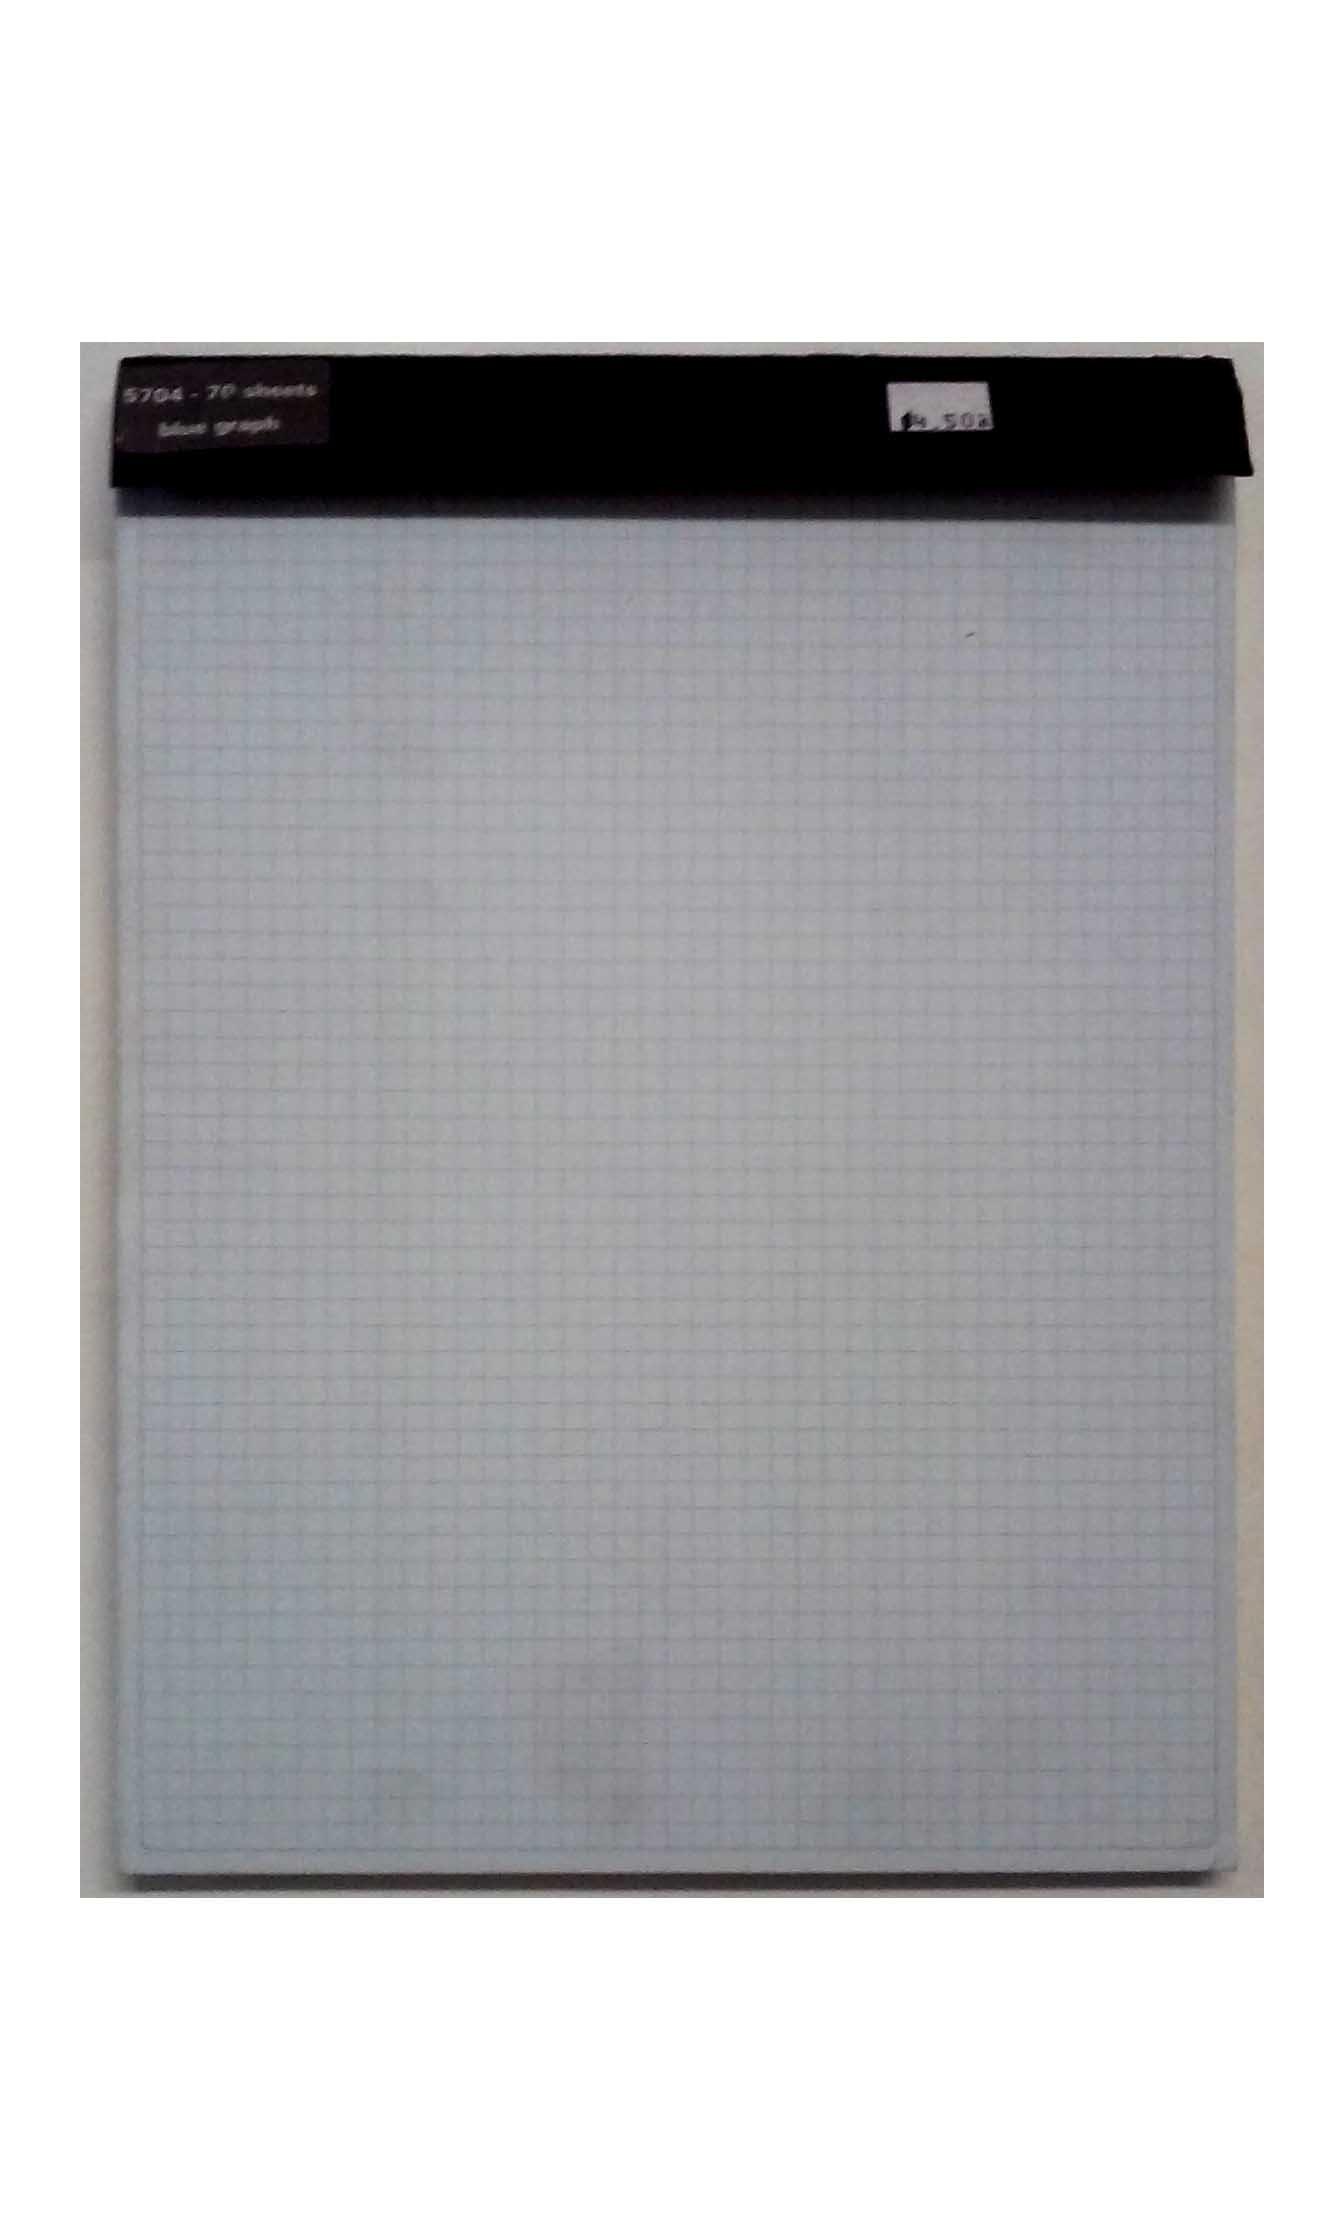 Exacompta Black Book 5704 B34e Graph Pad 70 Sheets 9'' x 11''